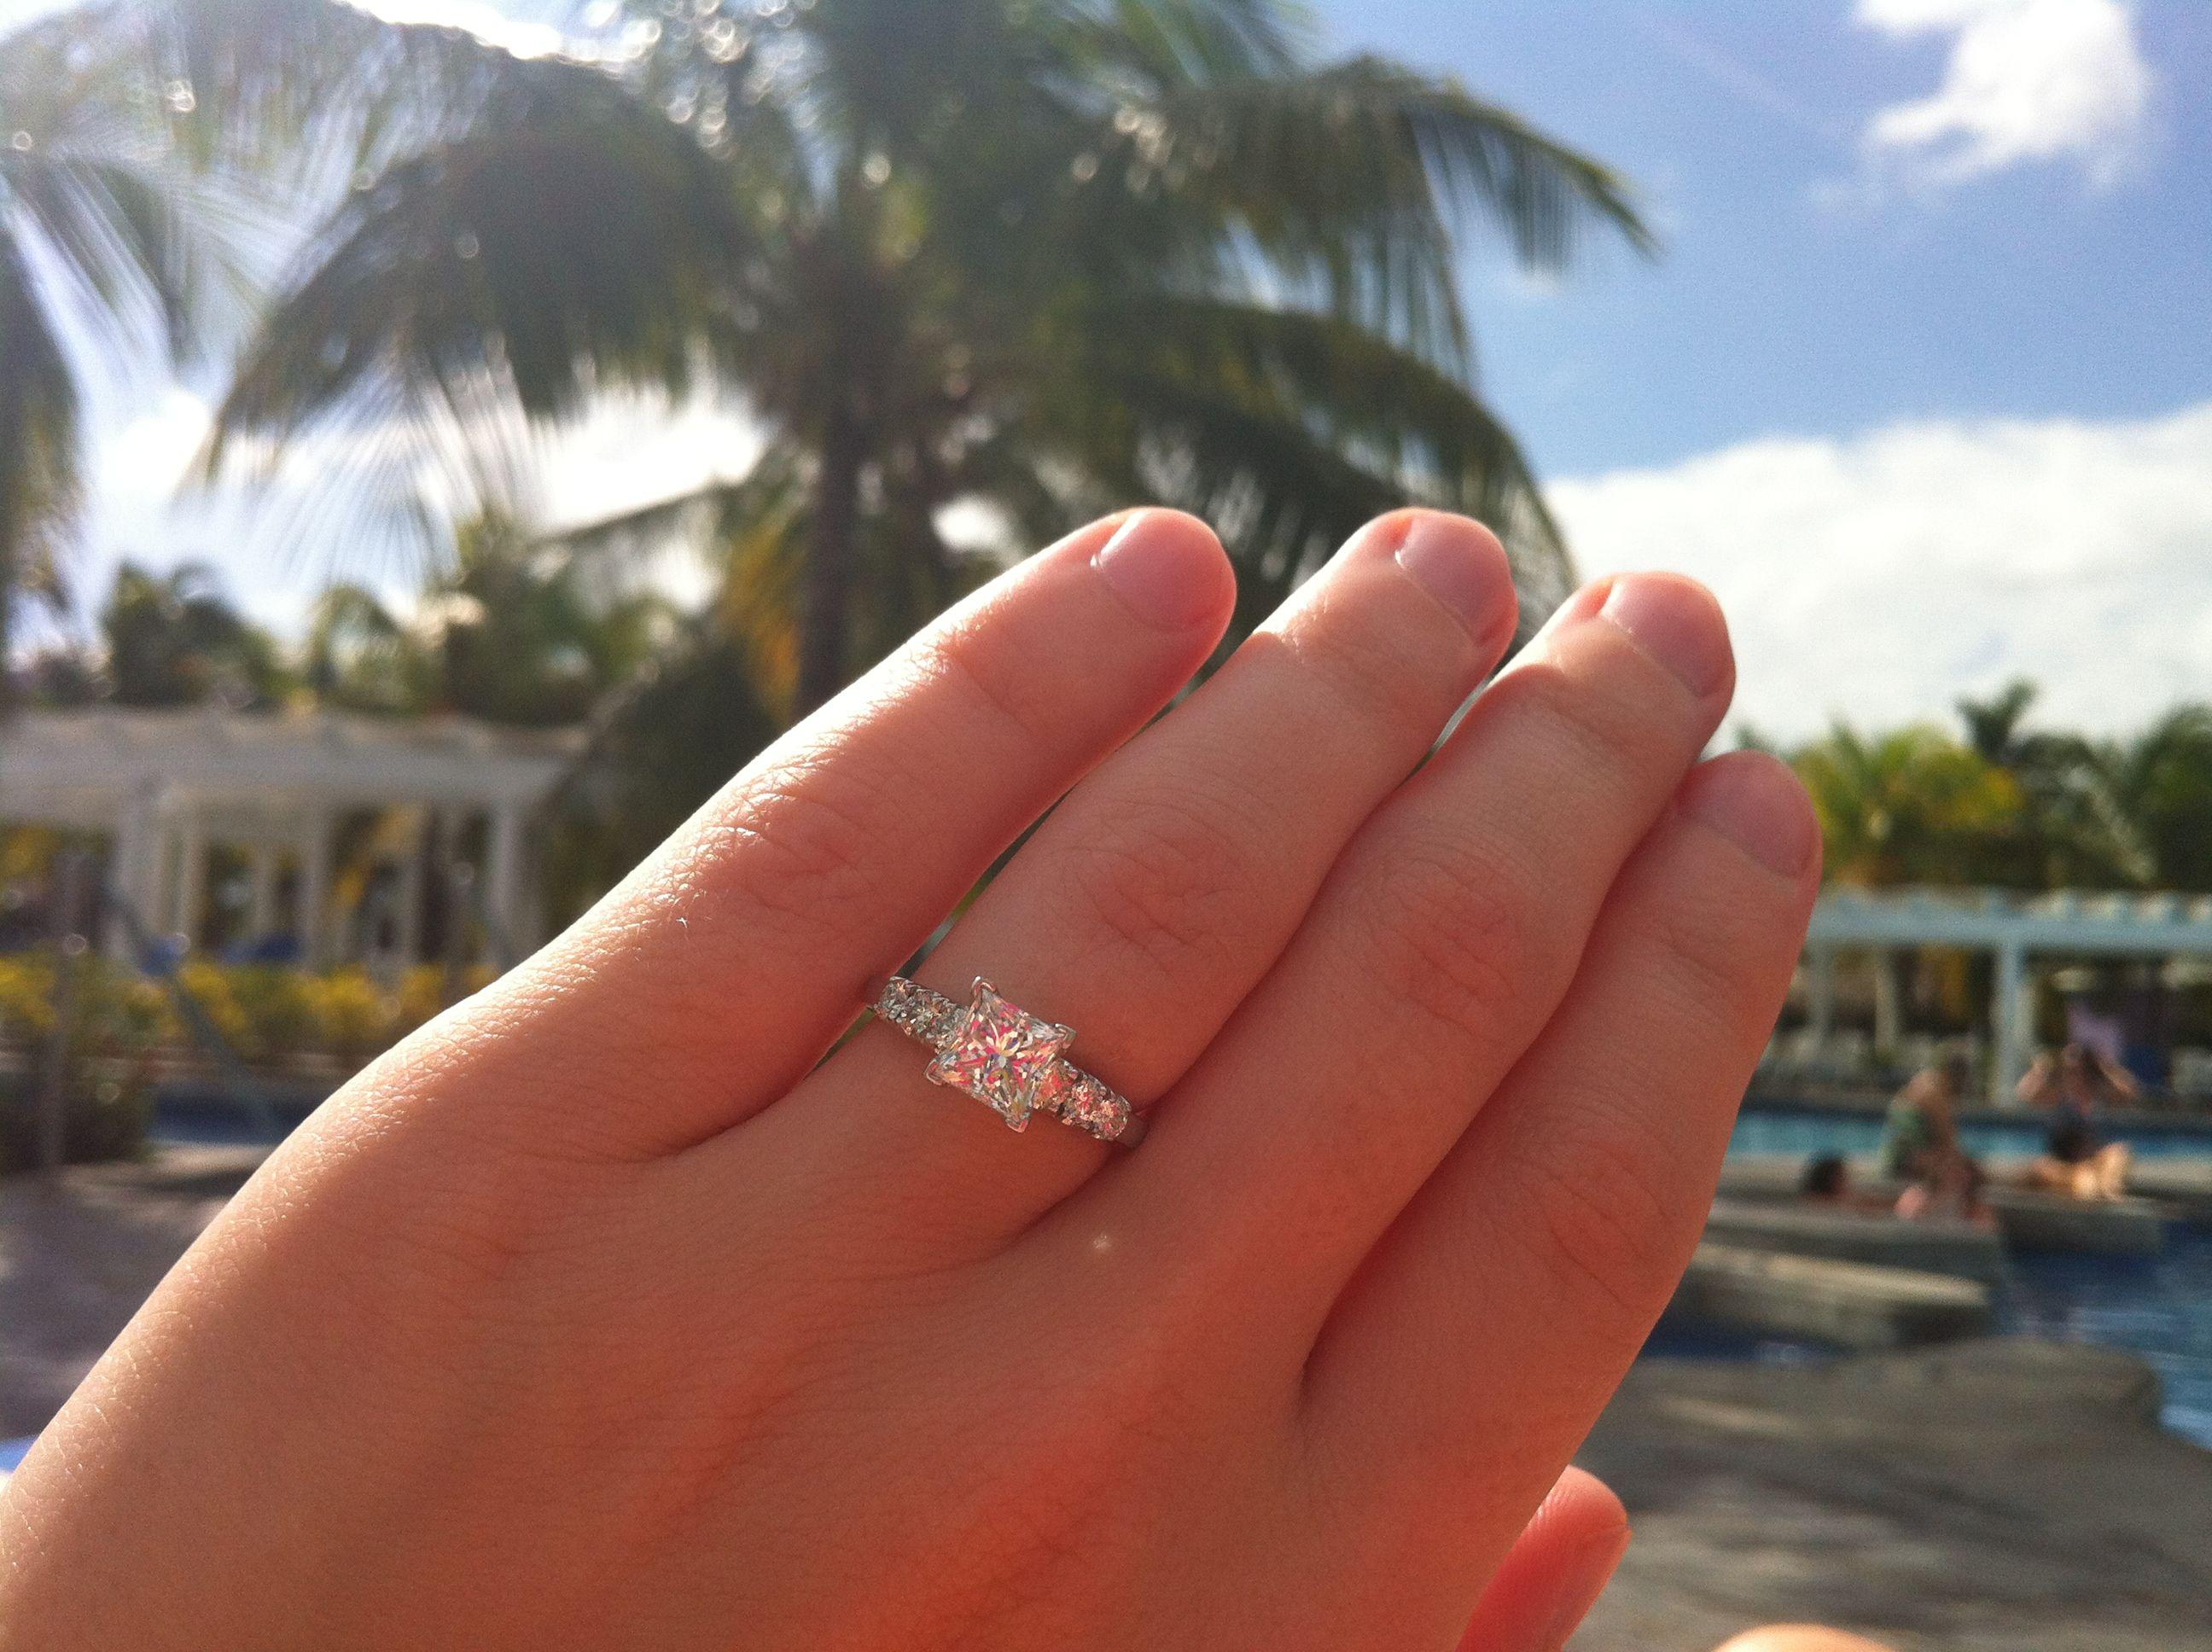 my gorgeouss ring! time to plan awayy =D